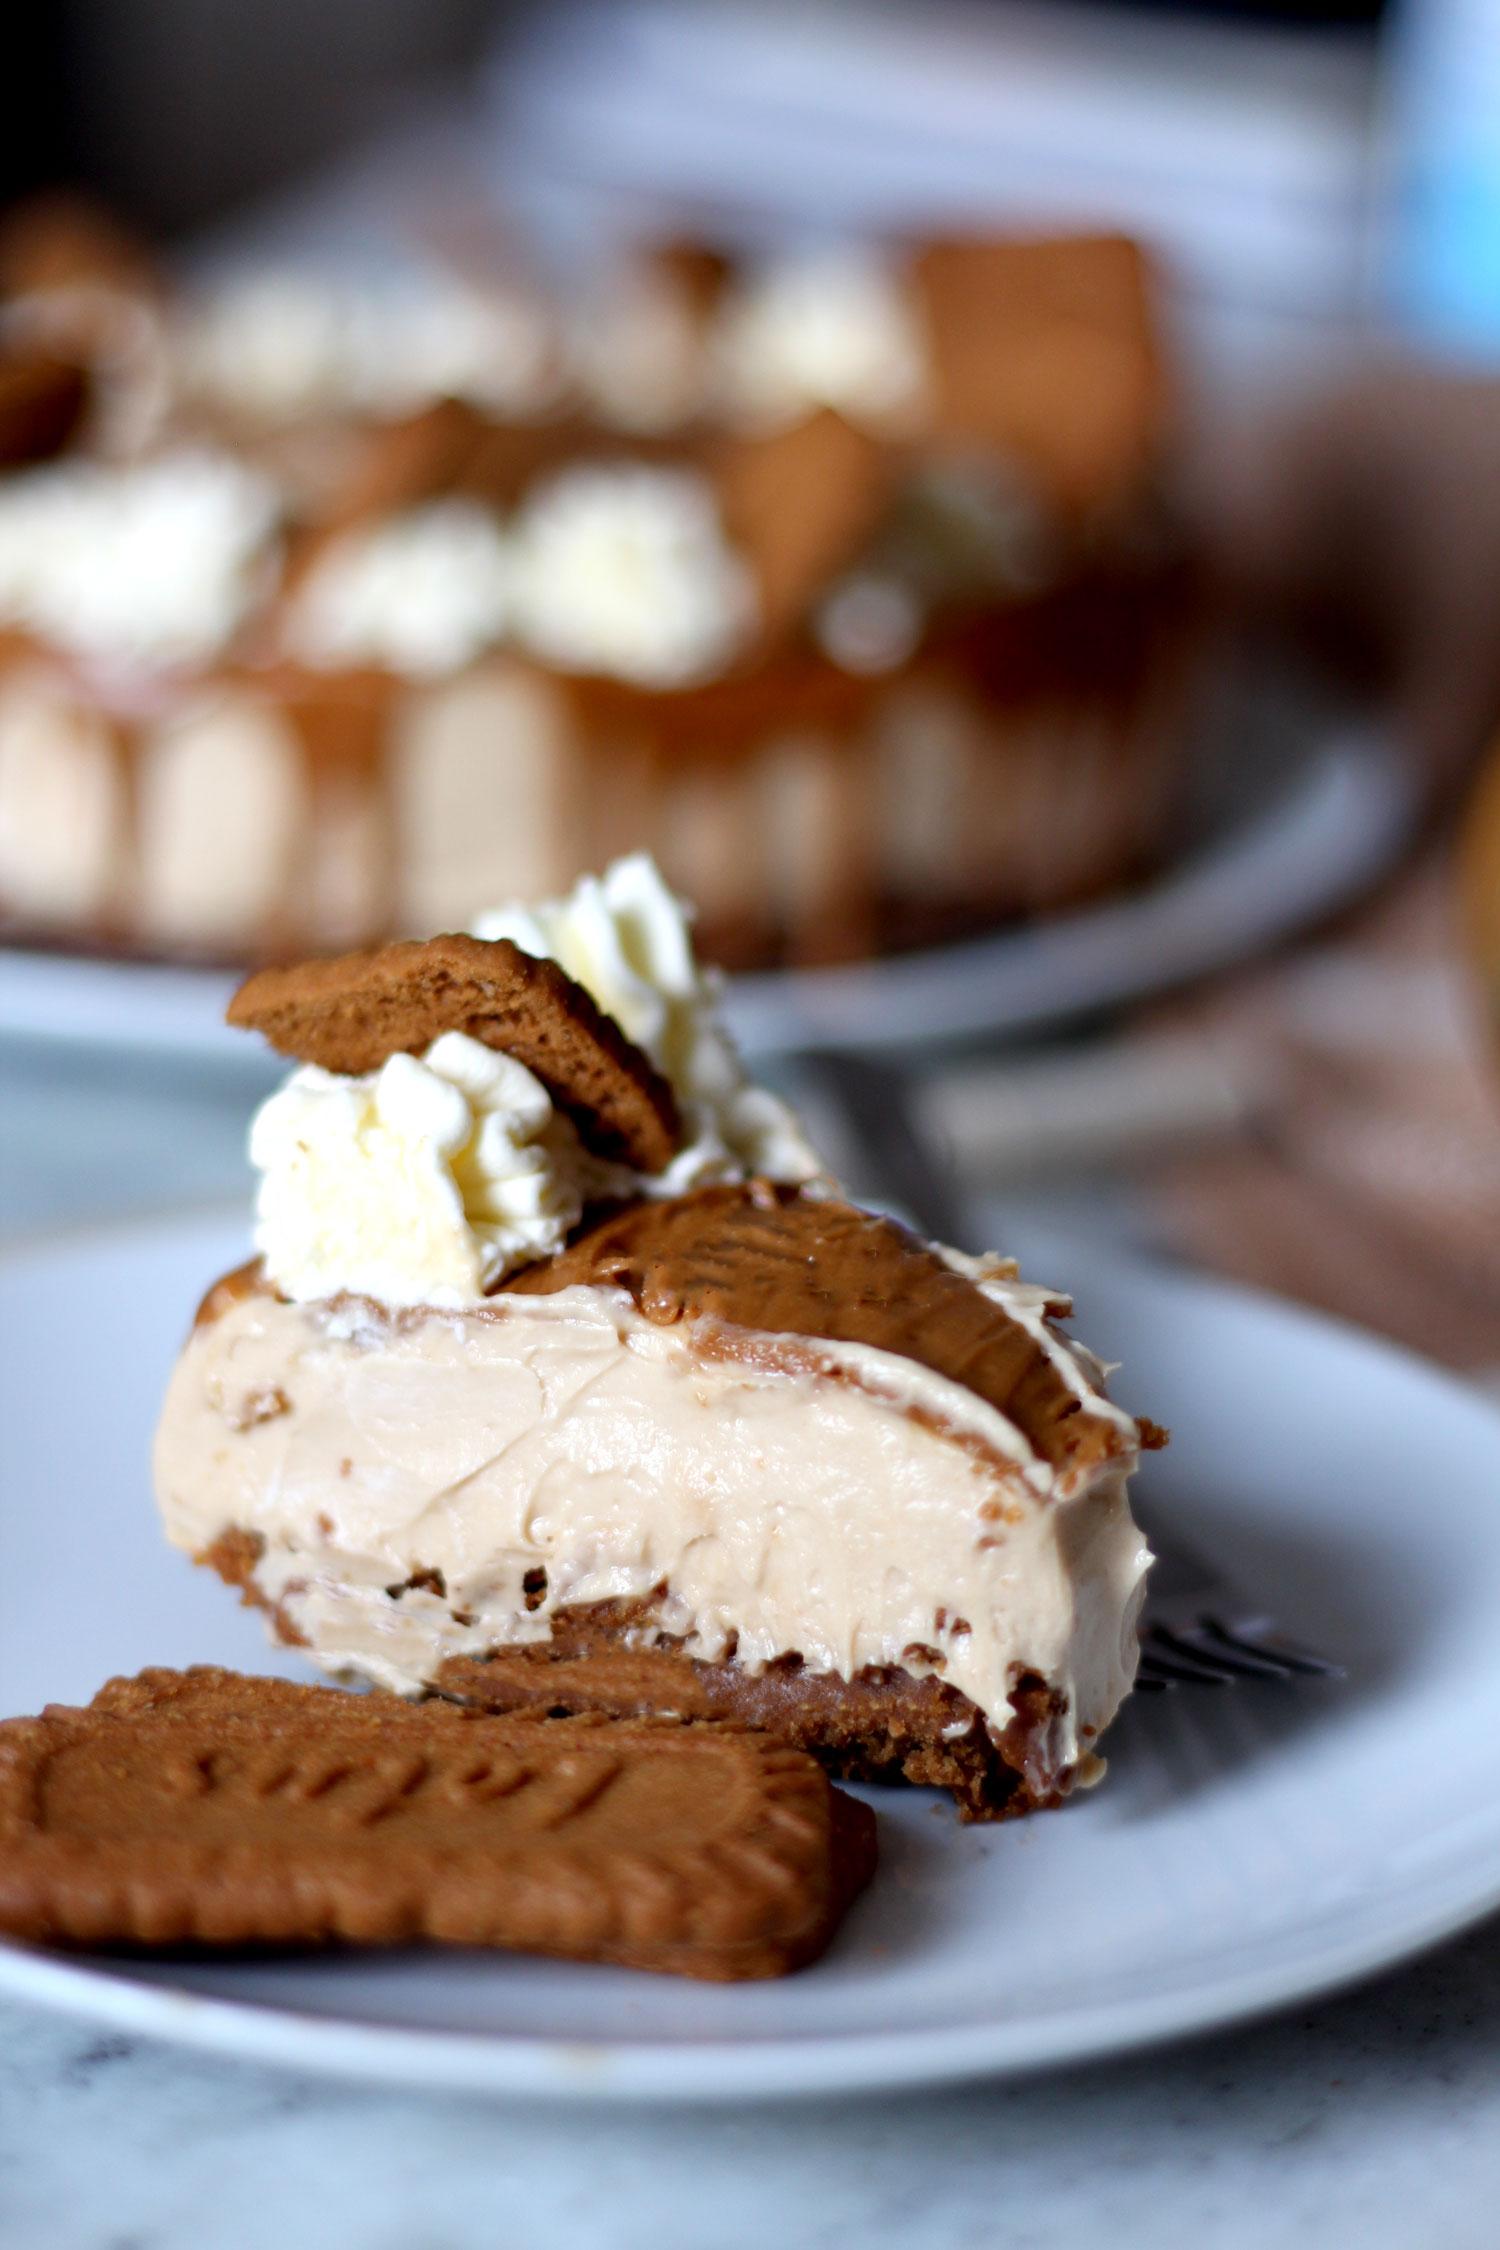 lotus-biscoff-cheesecake-recipe-easy-no-bake-5